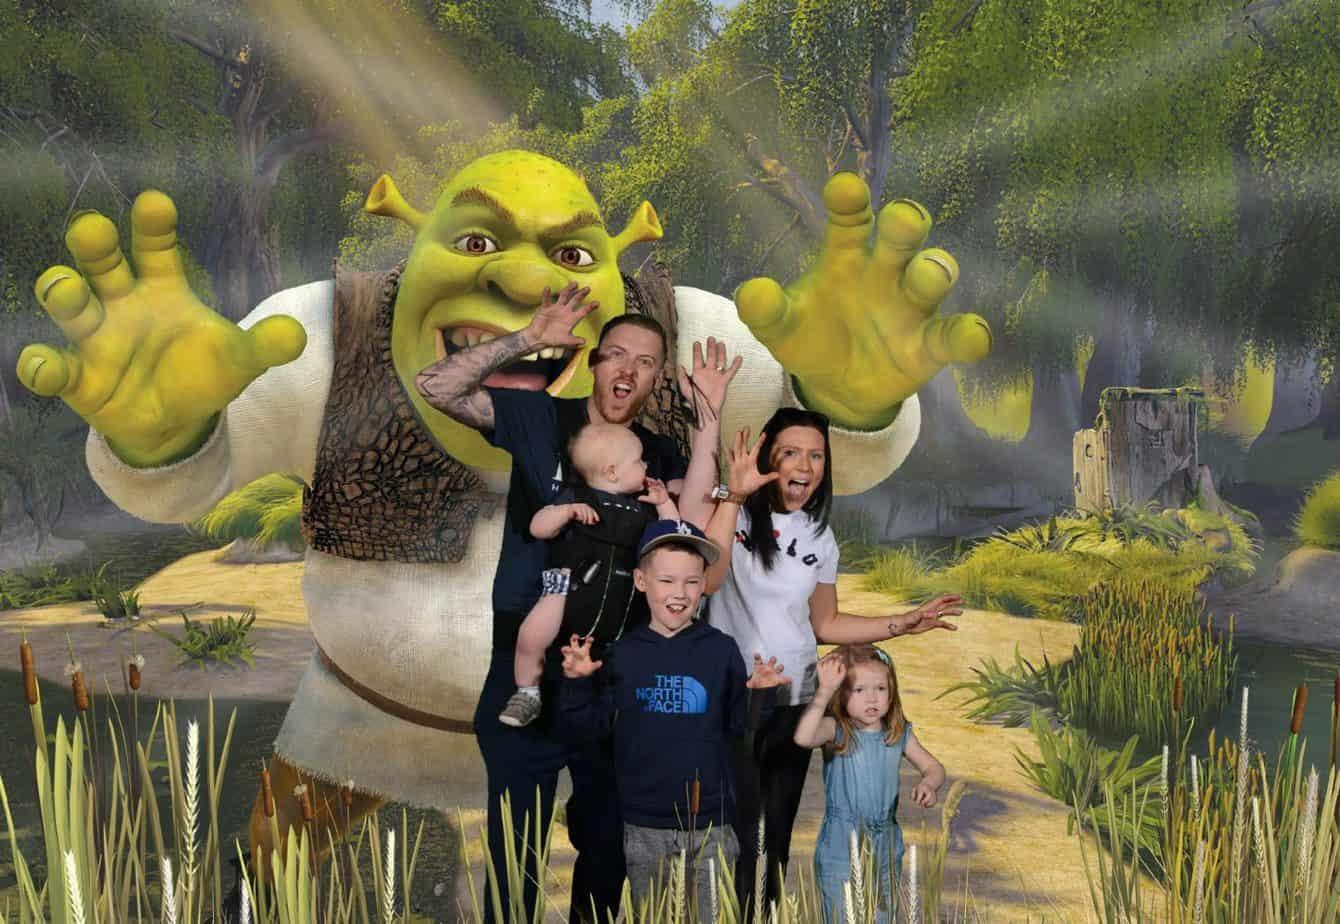 Us 5 in front of shrek at Shrek's Adventure